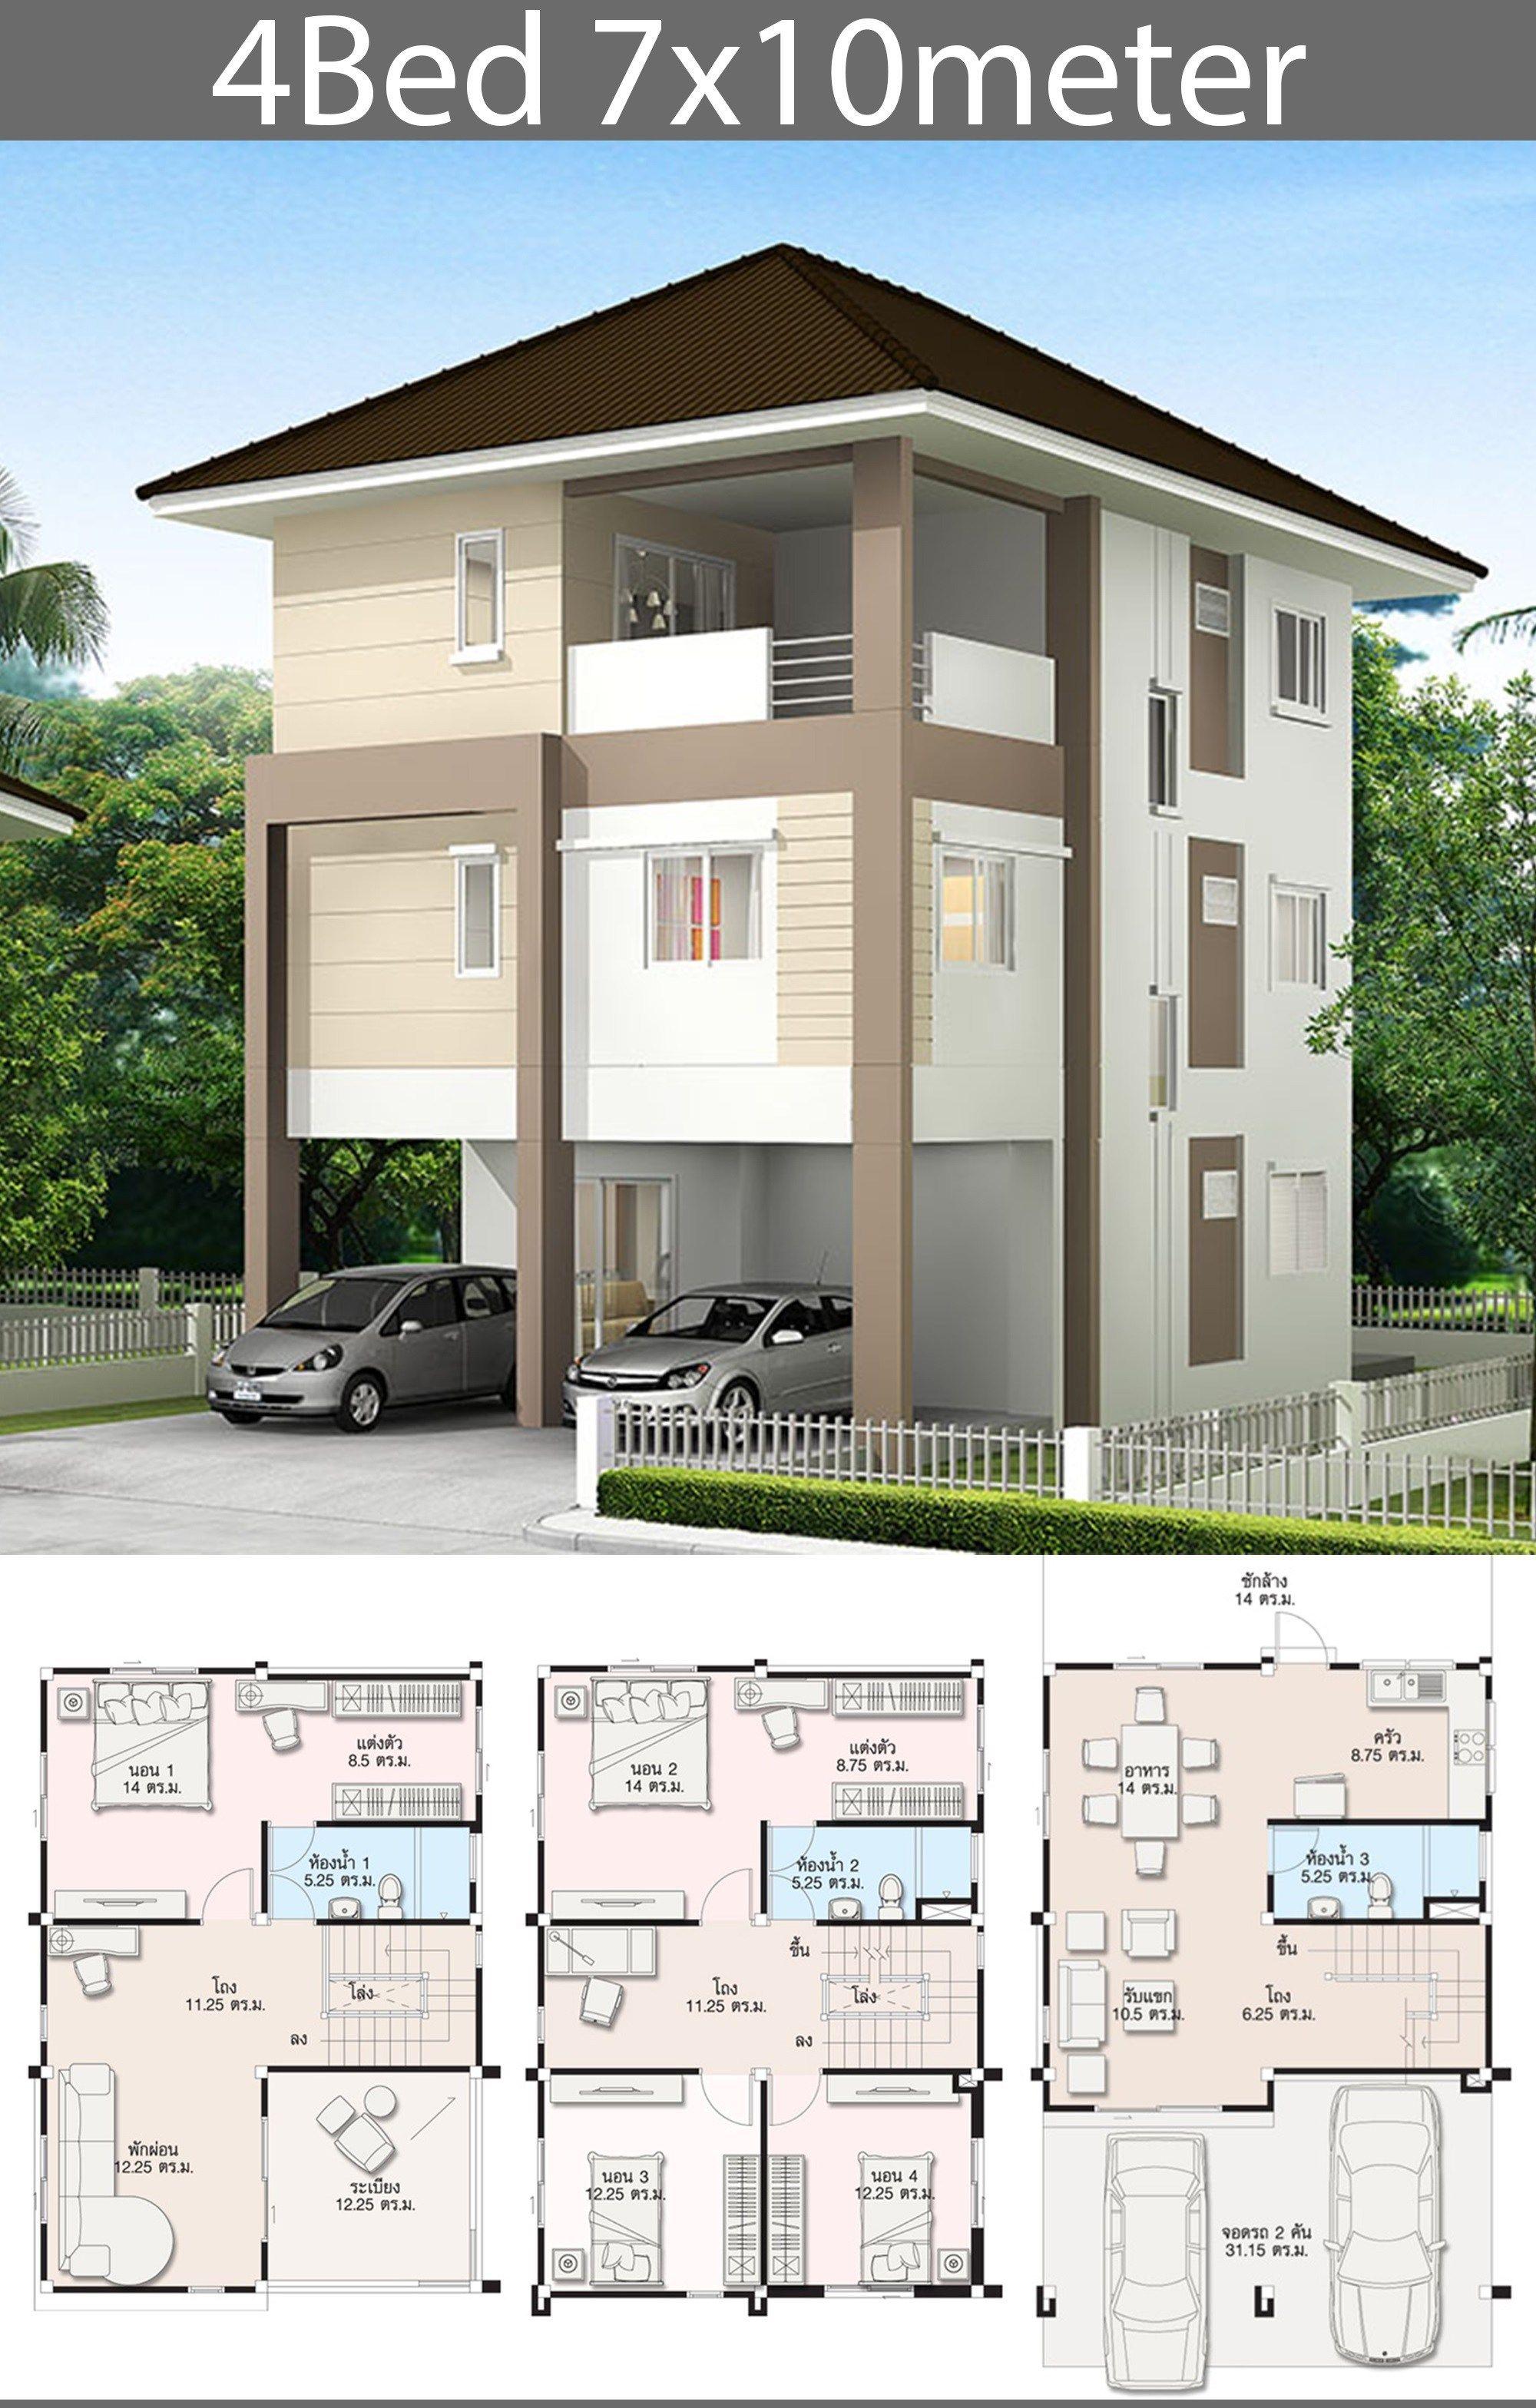 5 Ideas Home Design Plan 7x10m Samphoas Plan Home Design Plan Modern Contemporary House Plans 20x40 House Plans